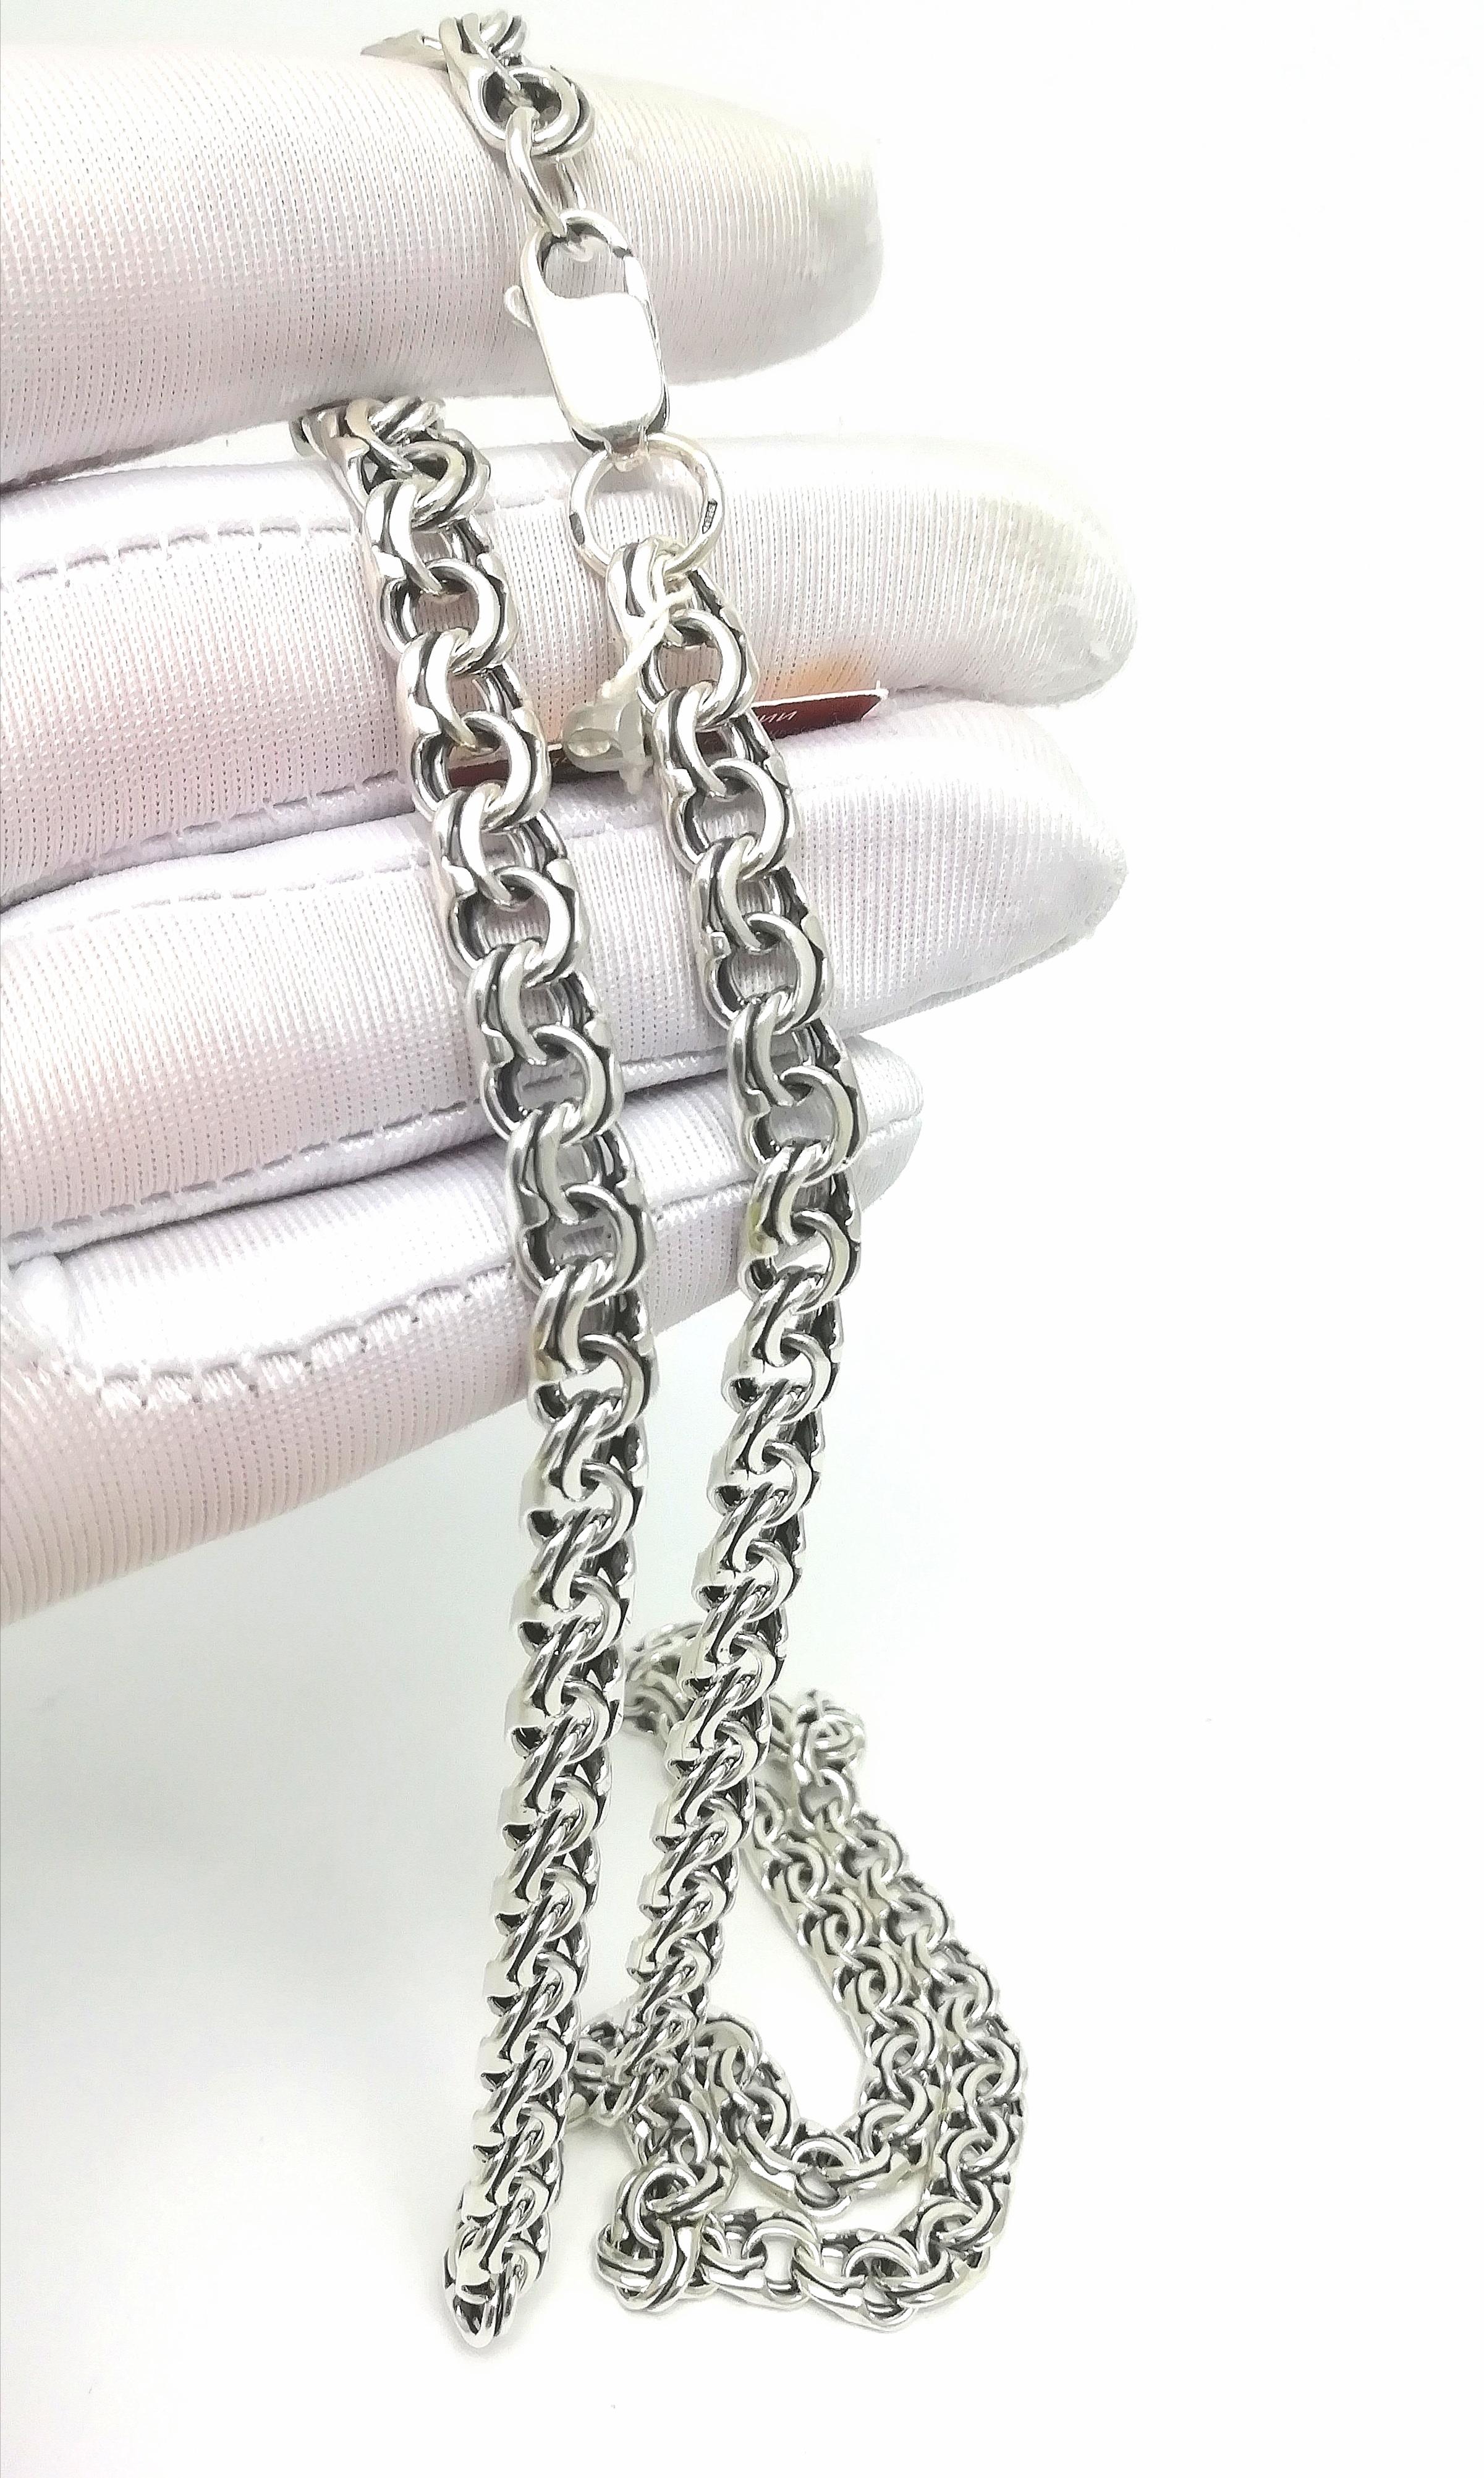 Серебро цепь дк240920-156 44,10гр